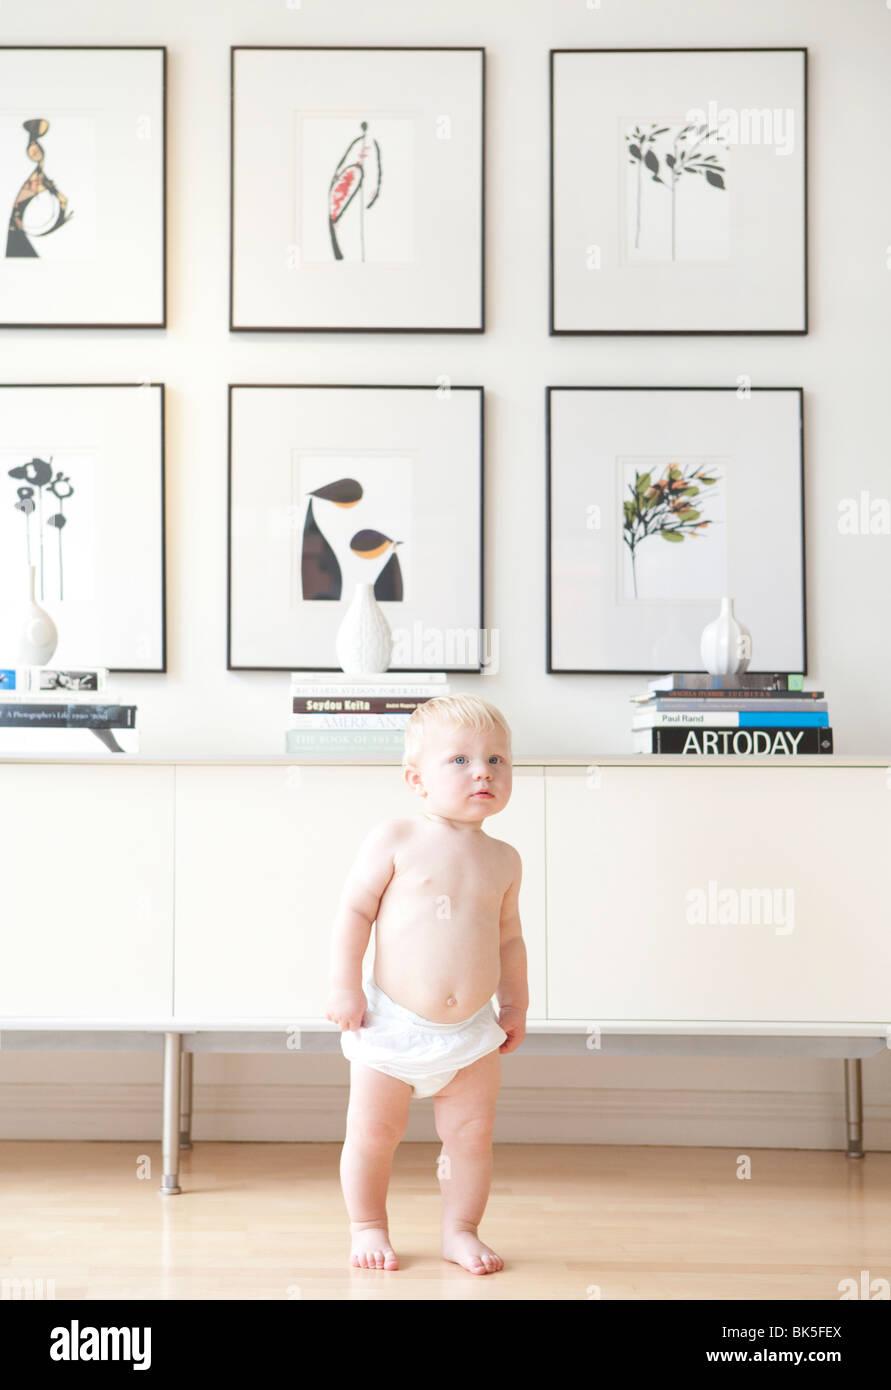 Baby in diaper in modern home - Stock Image